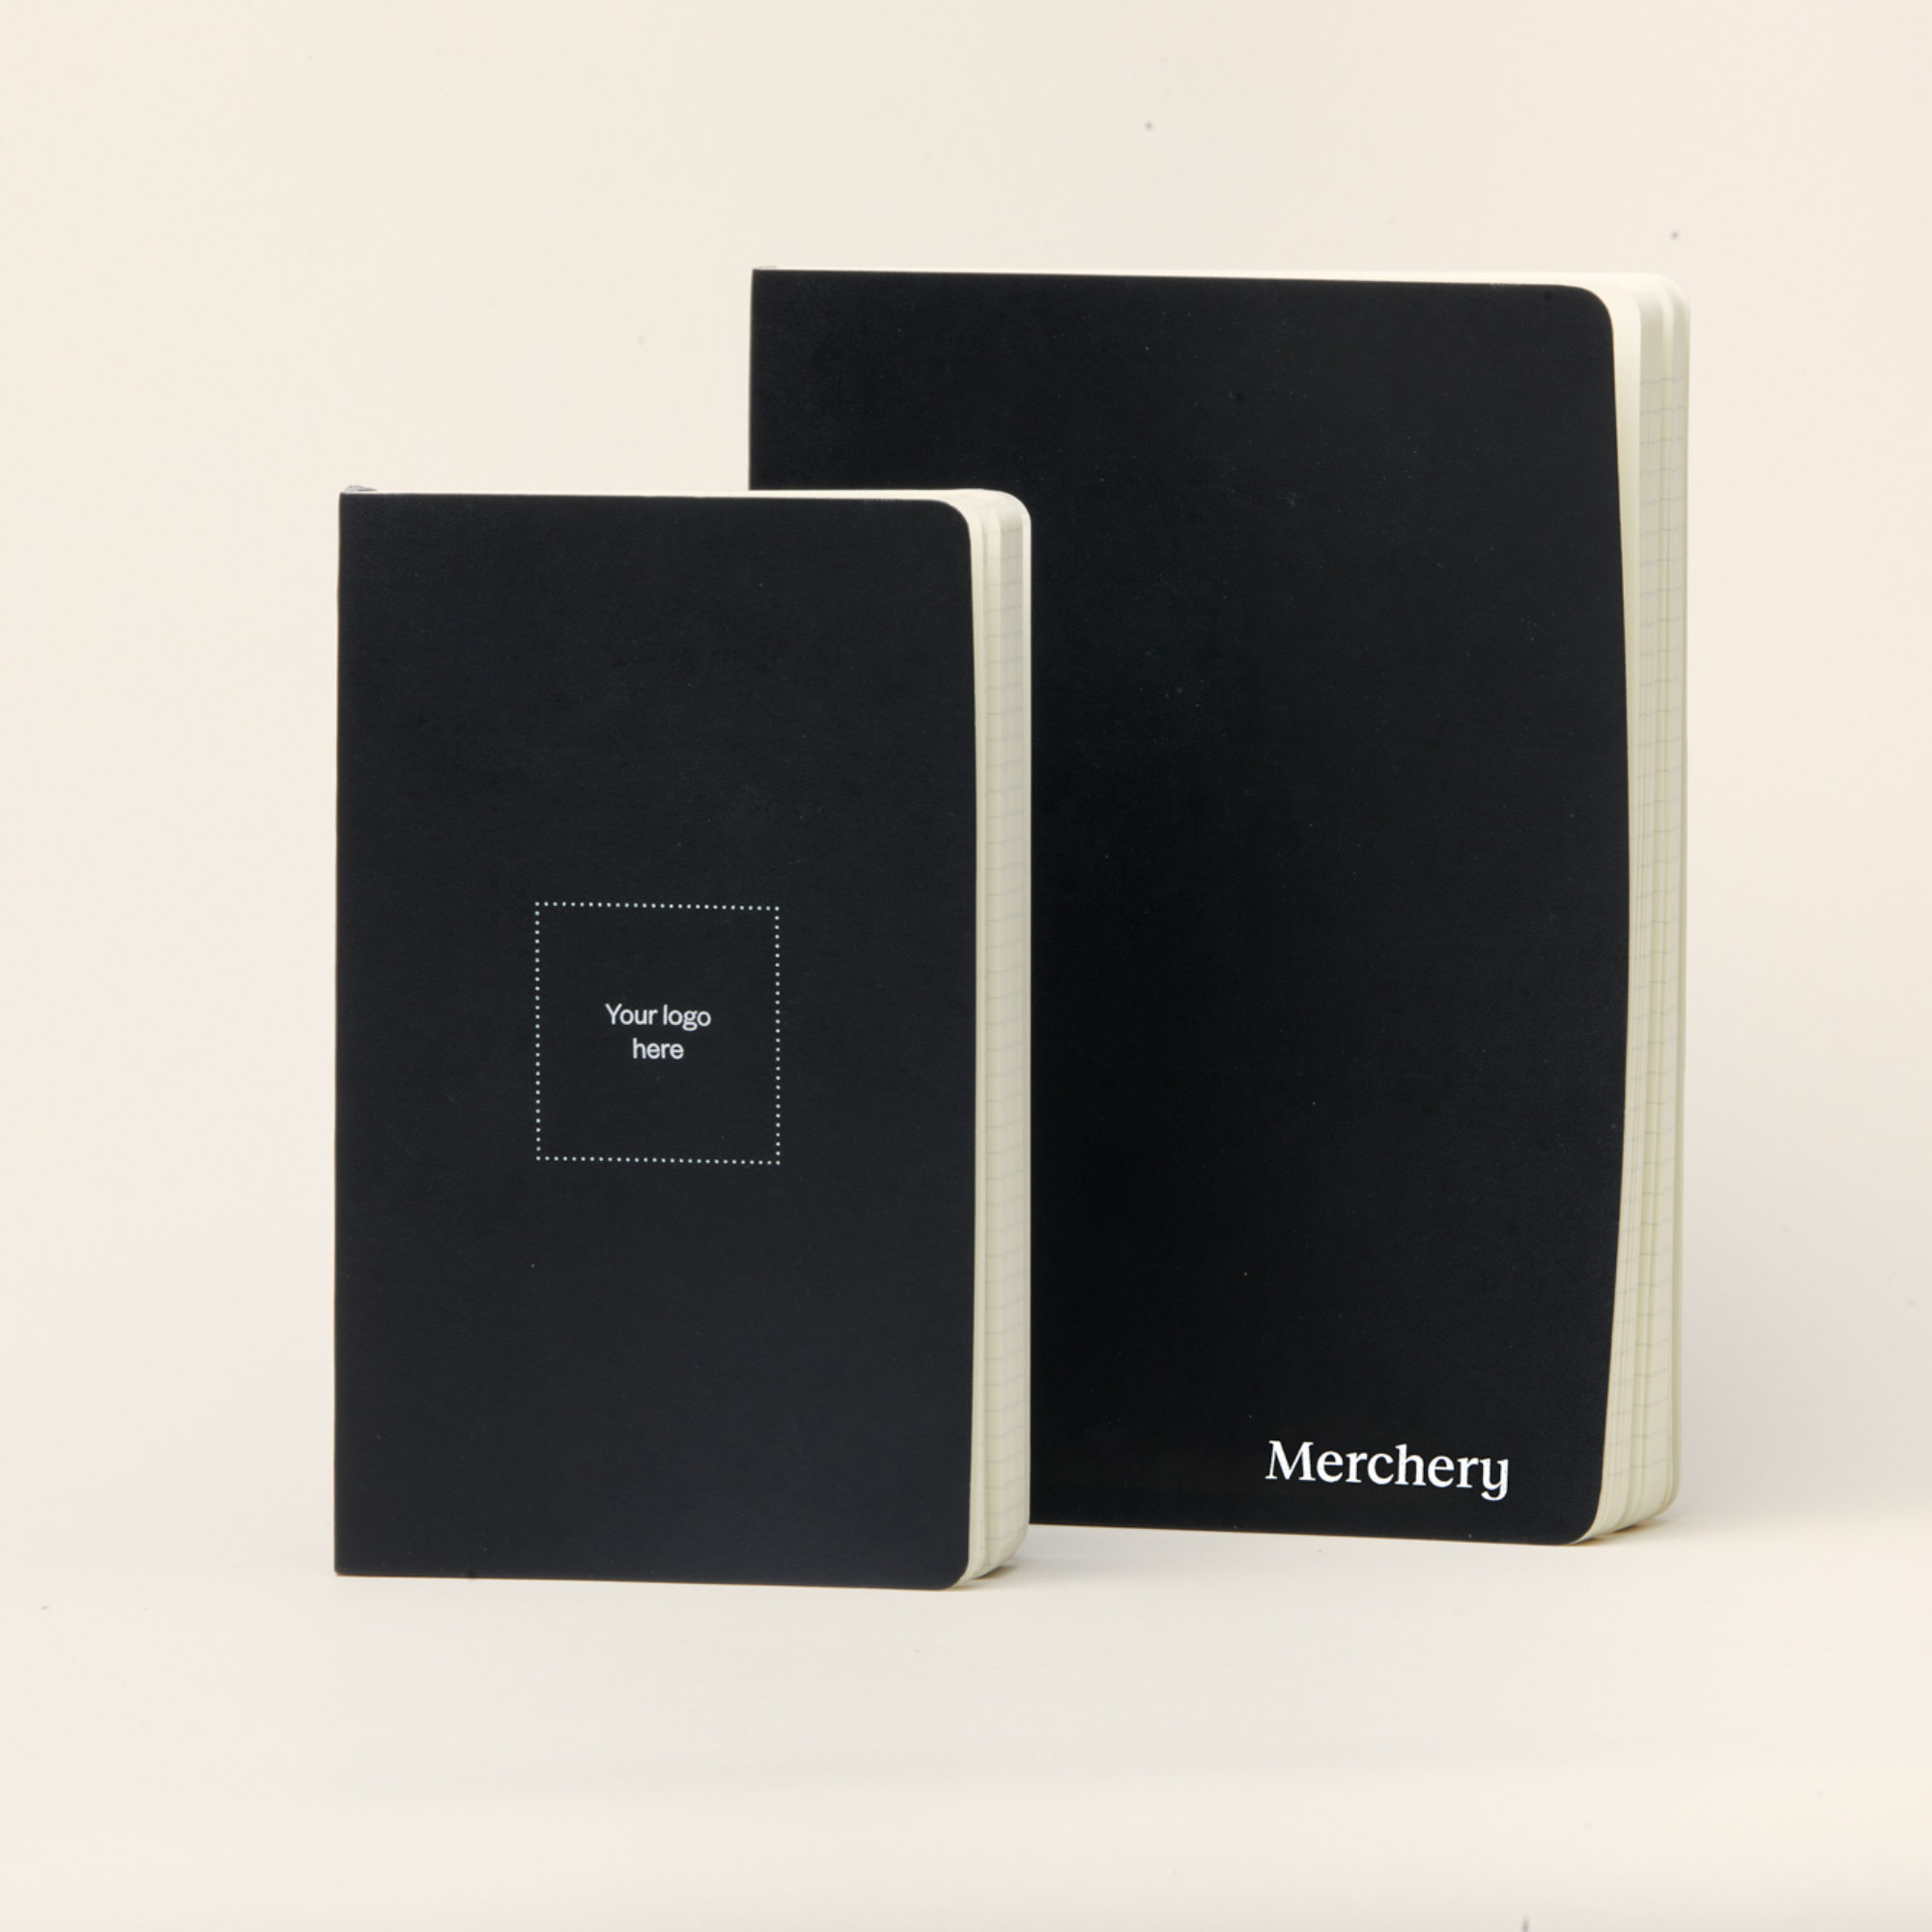 Merchery branded Moleskine L and XL